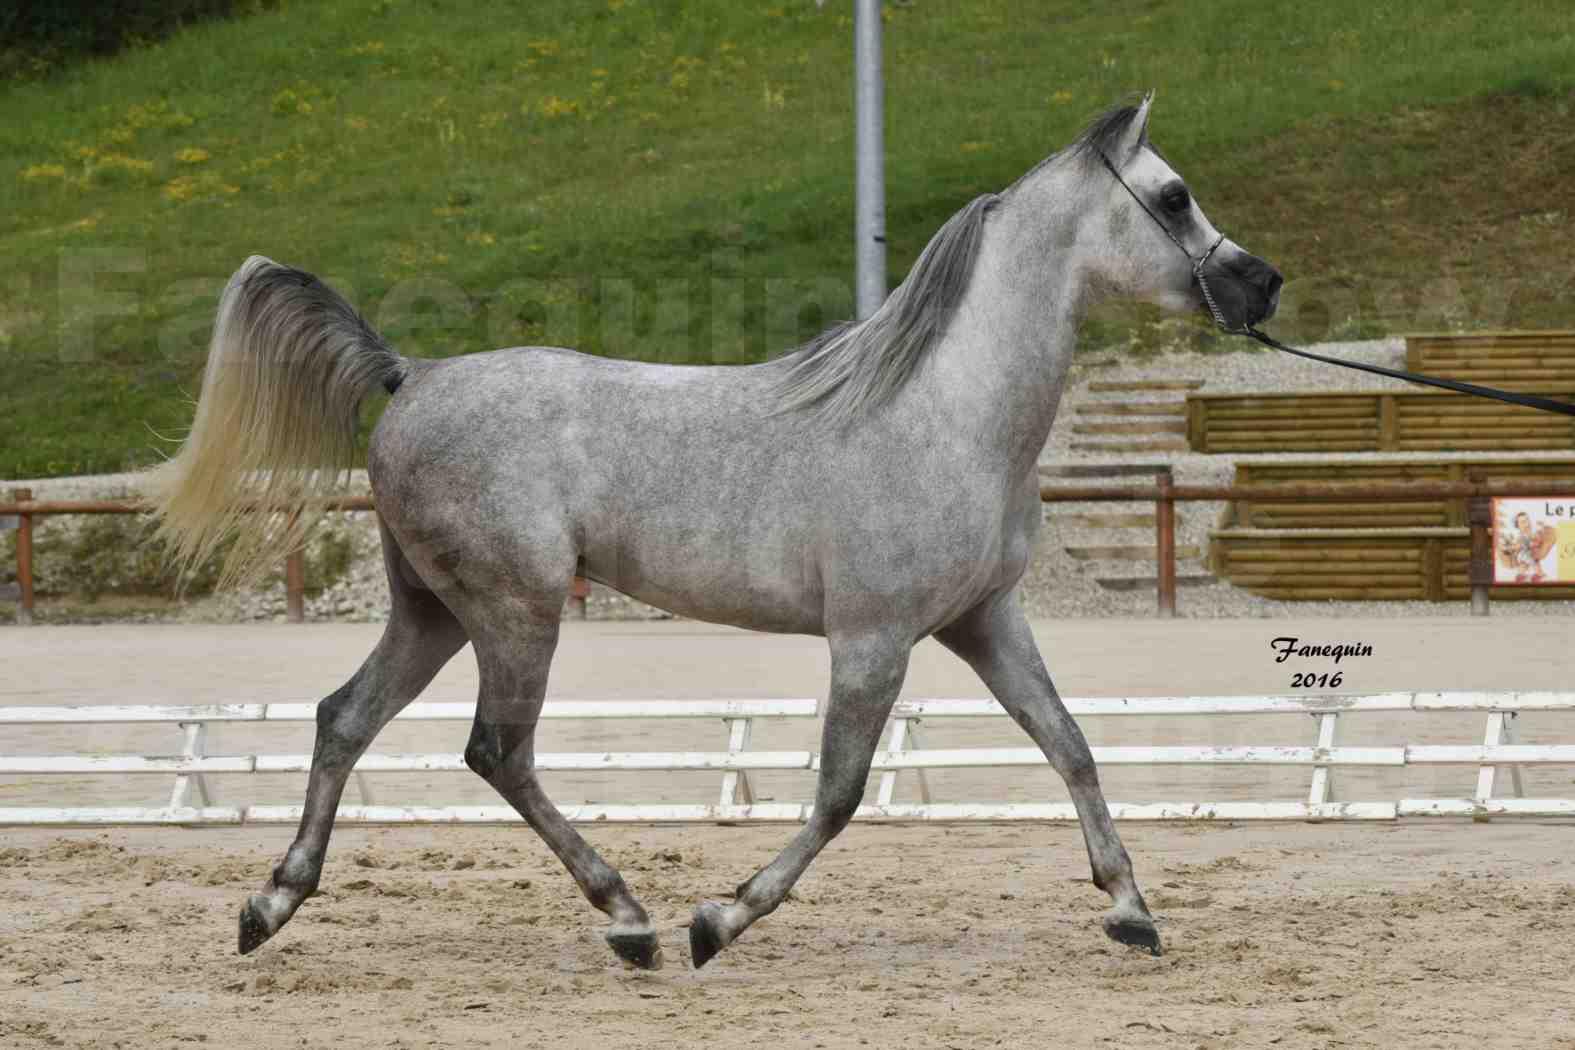 Show national de chevaux arabe à CHAZEY sur AIN - ANWAR ISHANE - 09